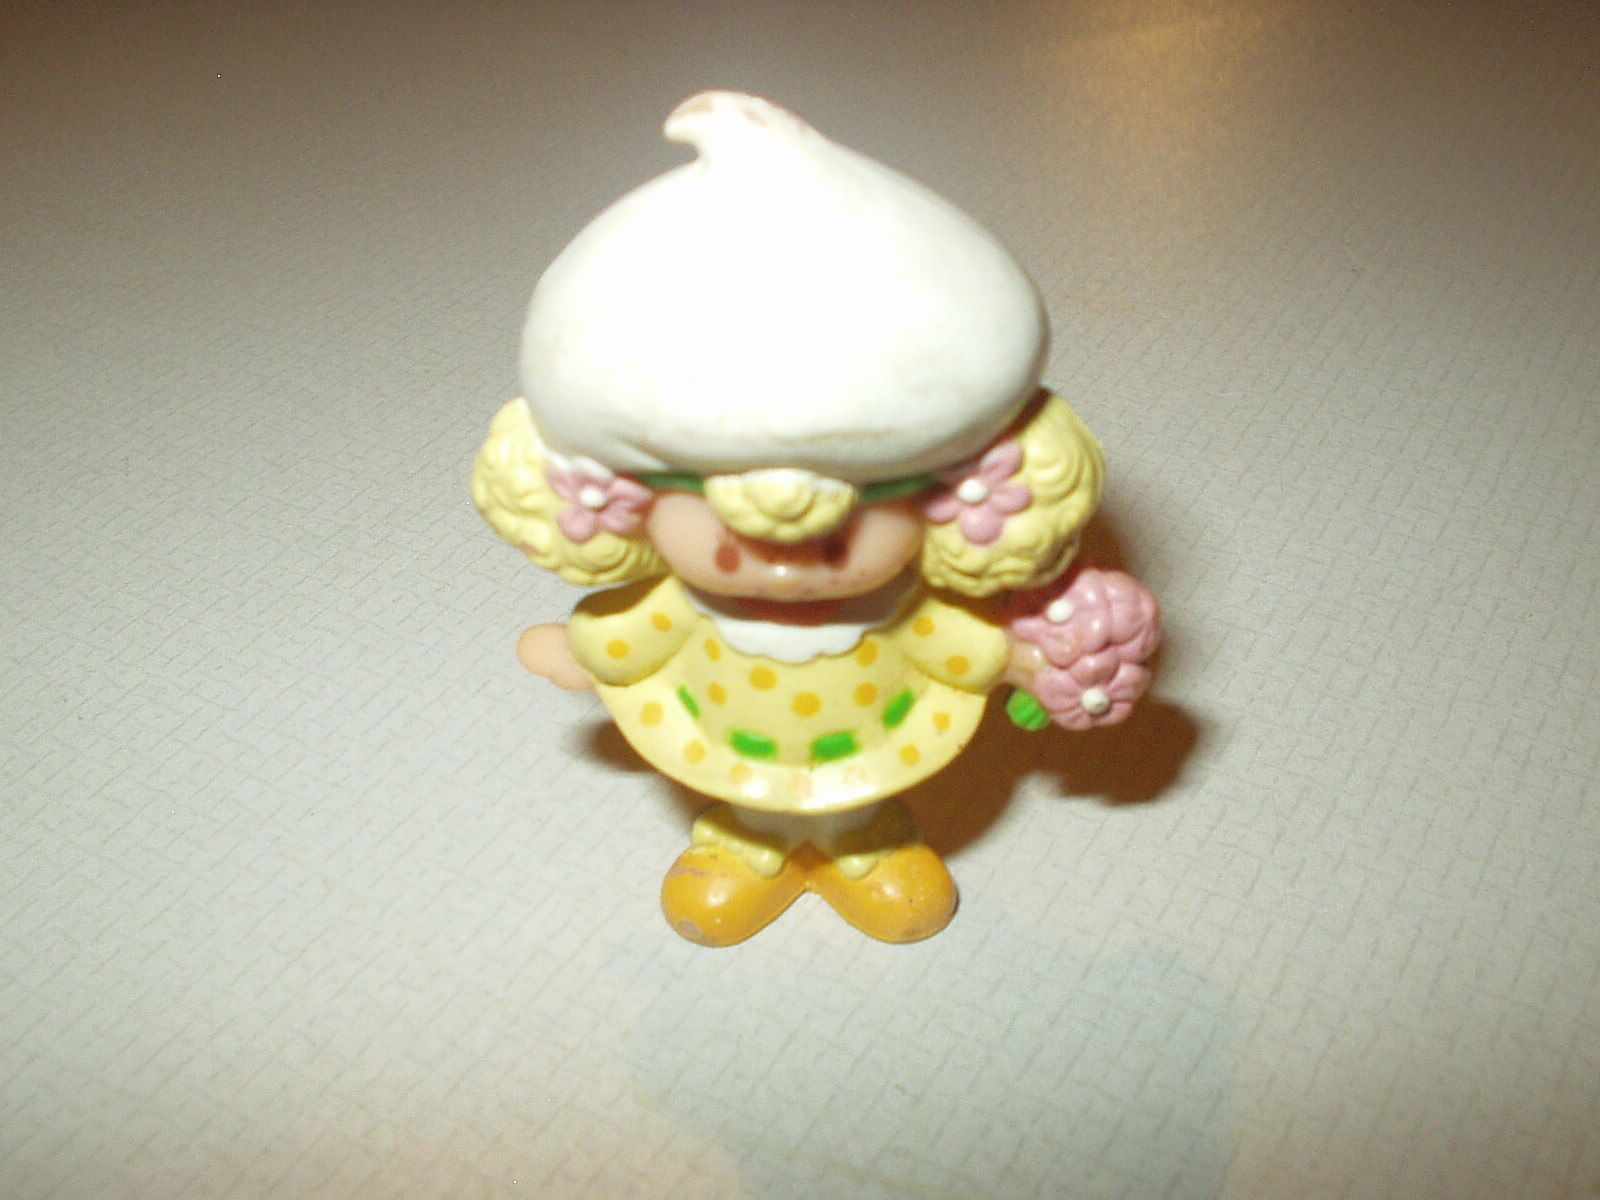 Vintage Strawberry Shortcake Friend PVC Figurine Toy Lemon